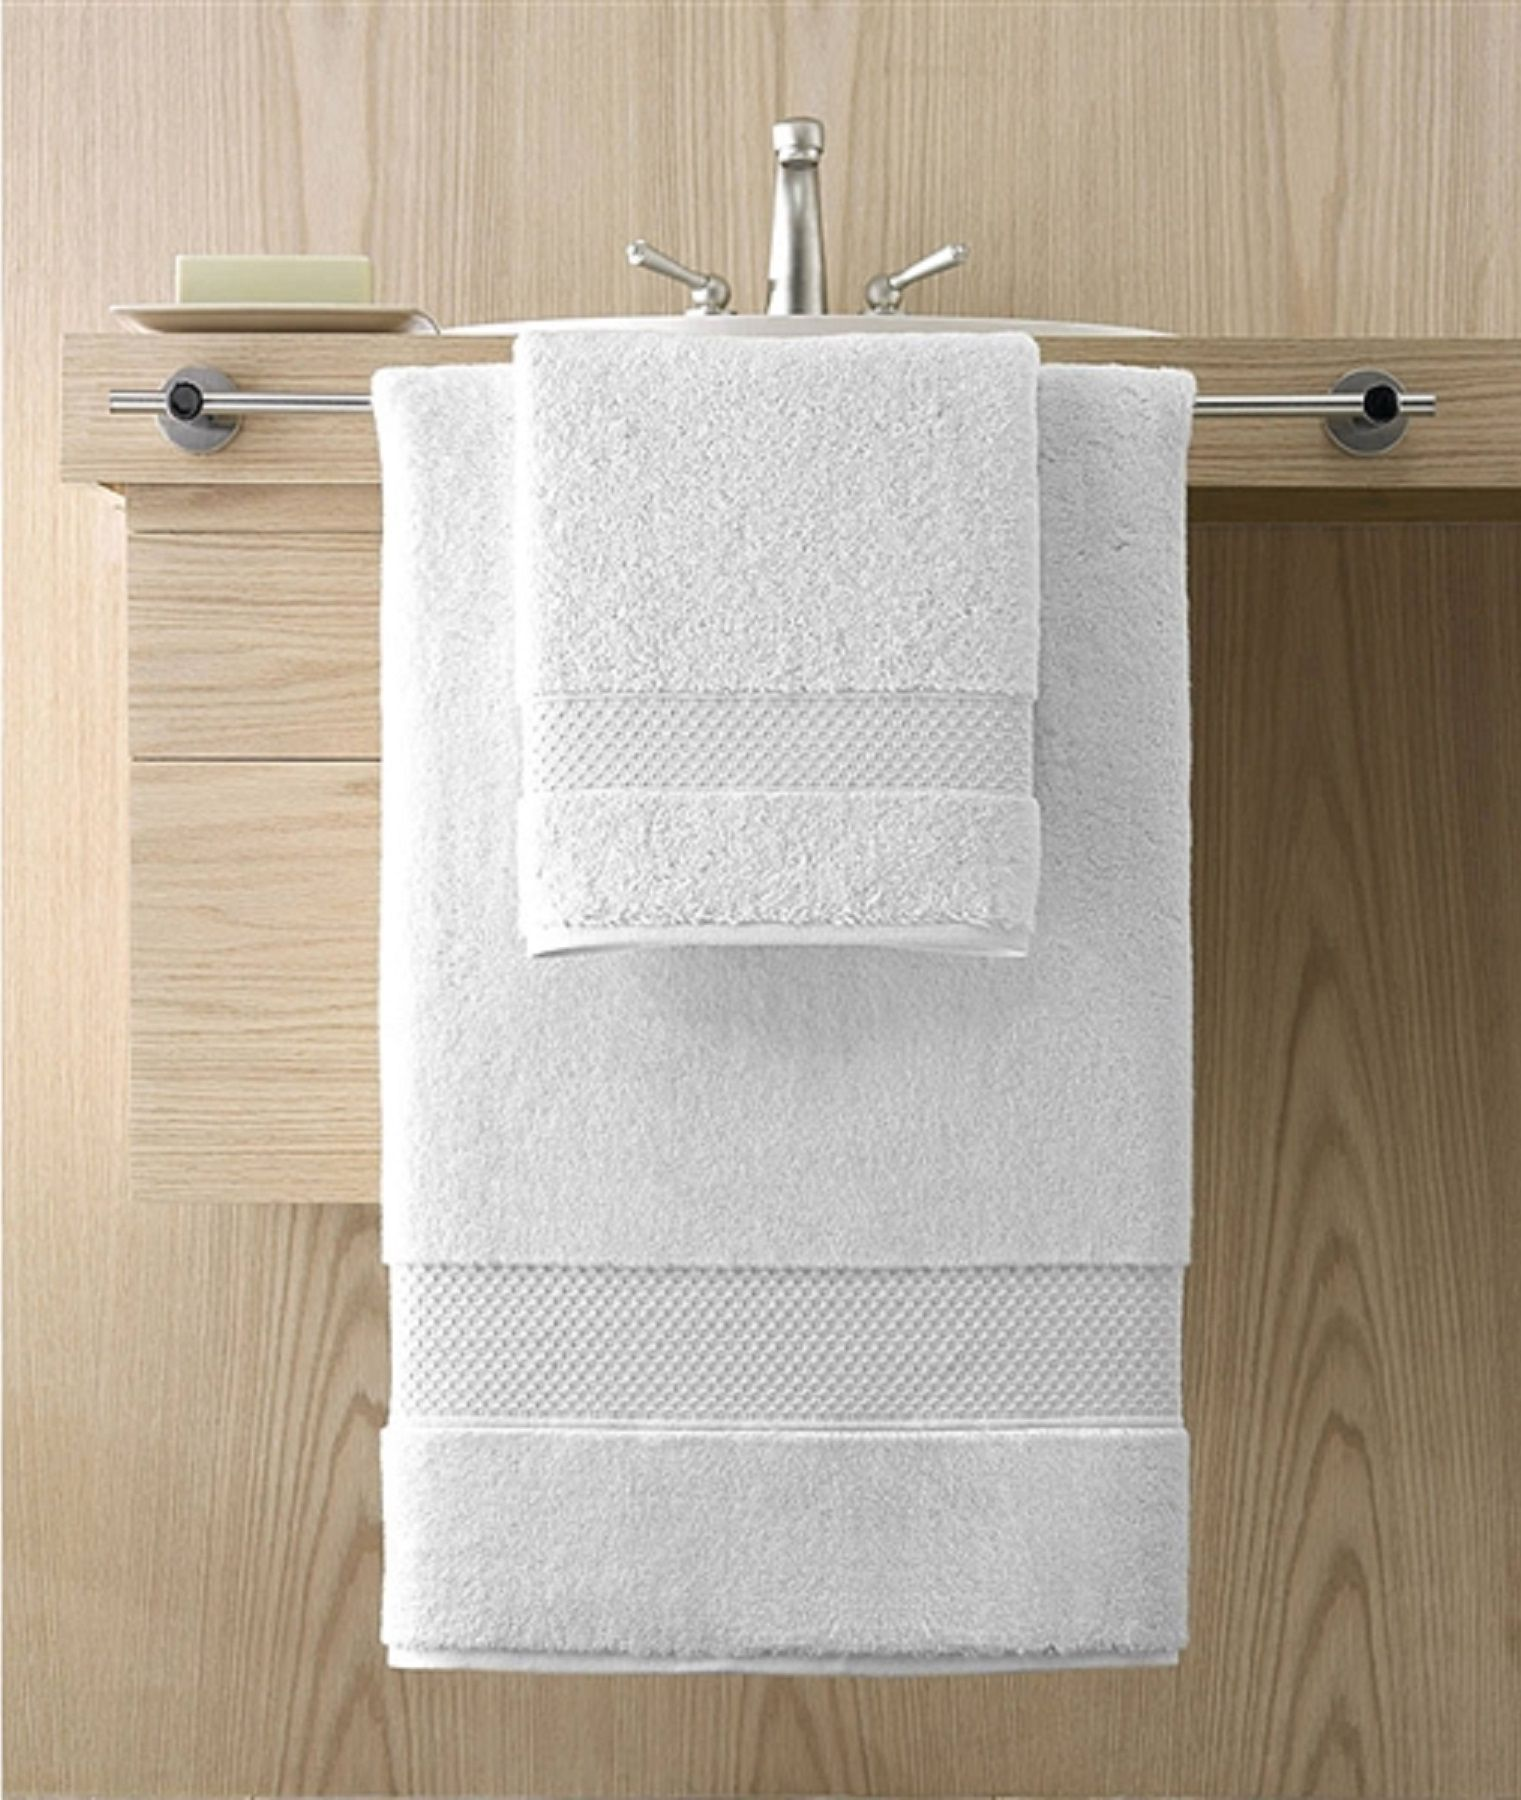 Коврики для ванной Банный коврик 51x86 Kassatex Elegance White elitnyy-bannyy-kovrik-elegance-white-ot-kassatex-portugaliya.jpg